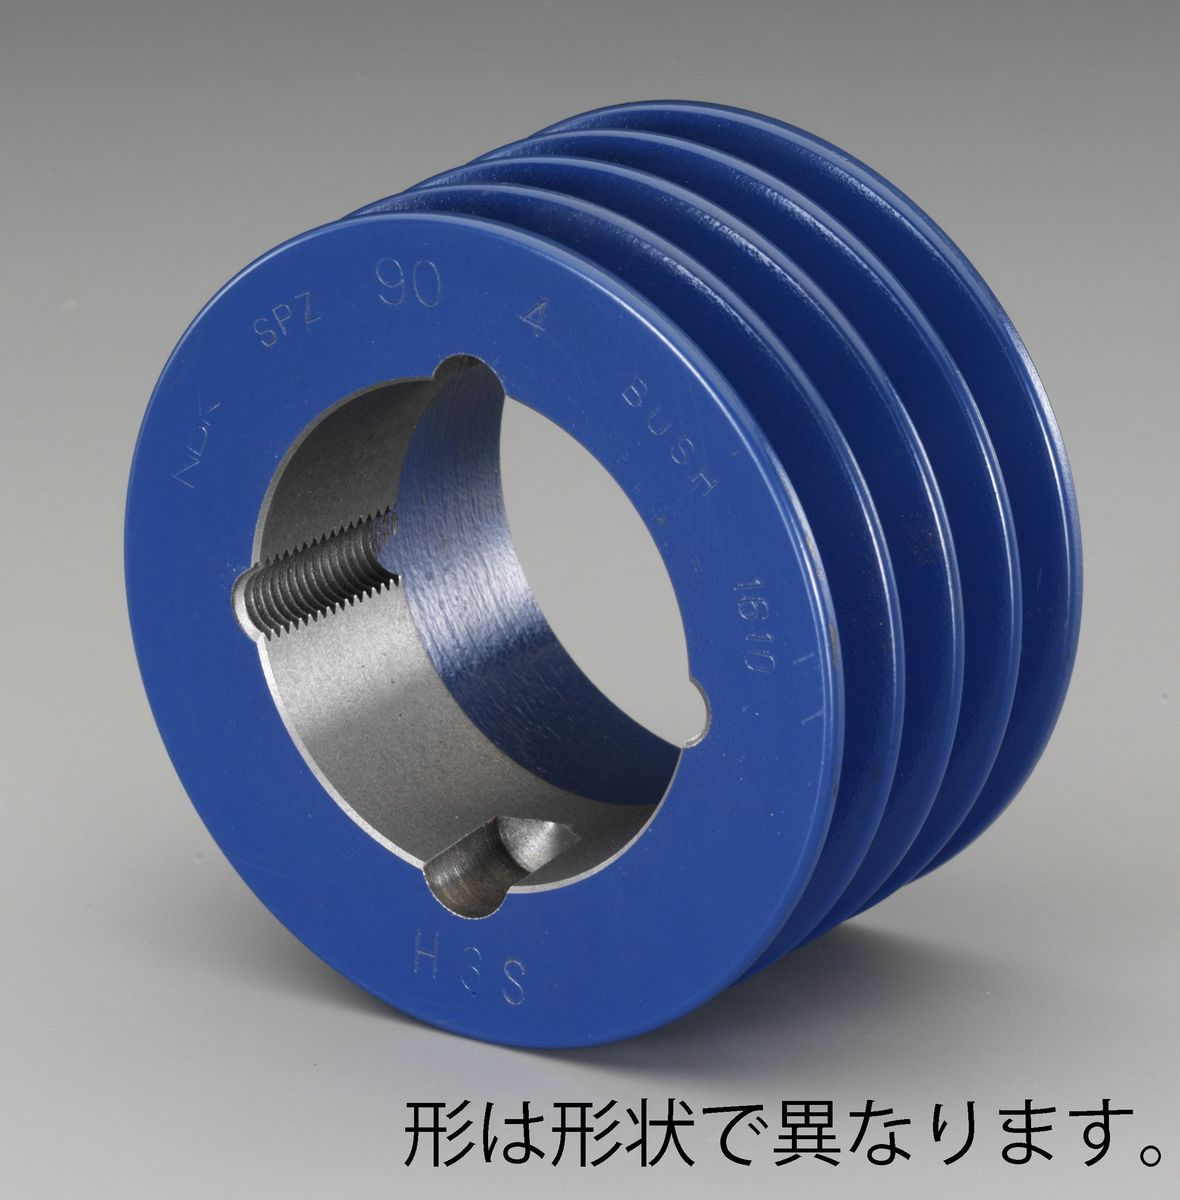 エスコ ESCO 265mm 4本構 Vプーリー SPプーリー/50U 000012266163 HD店